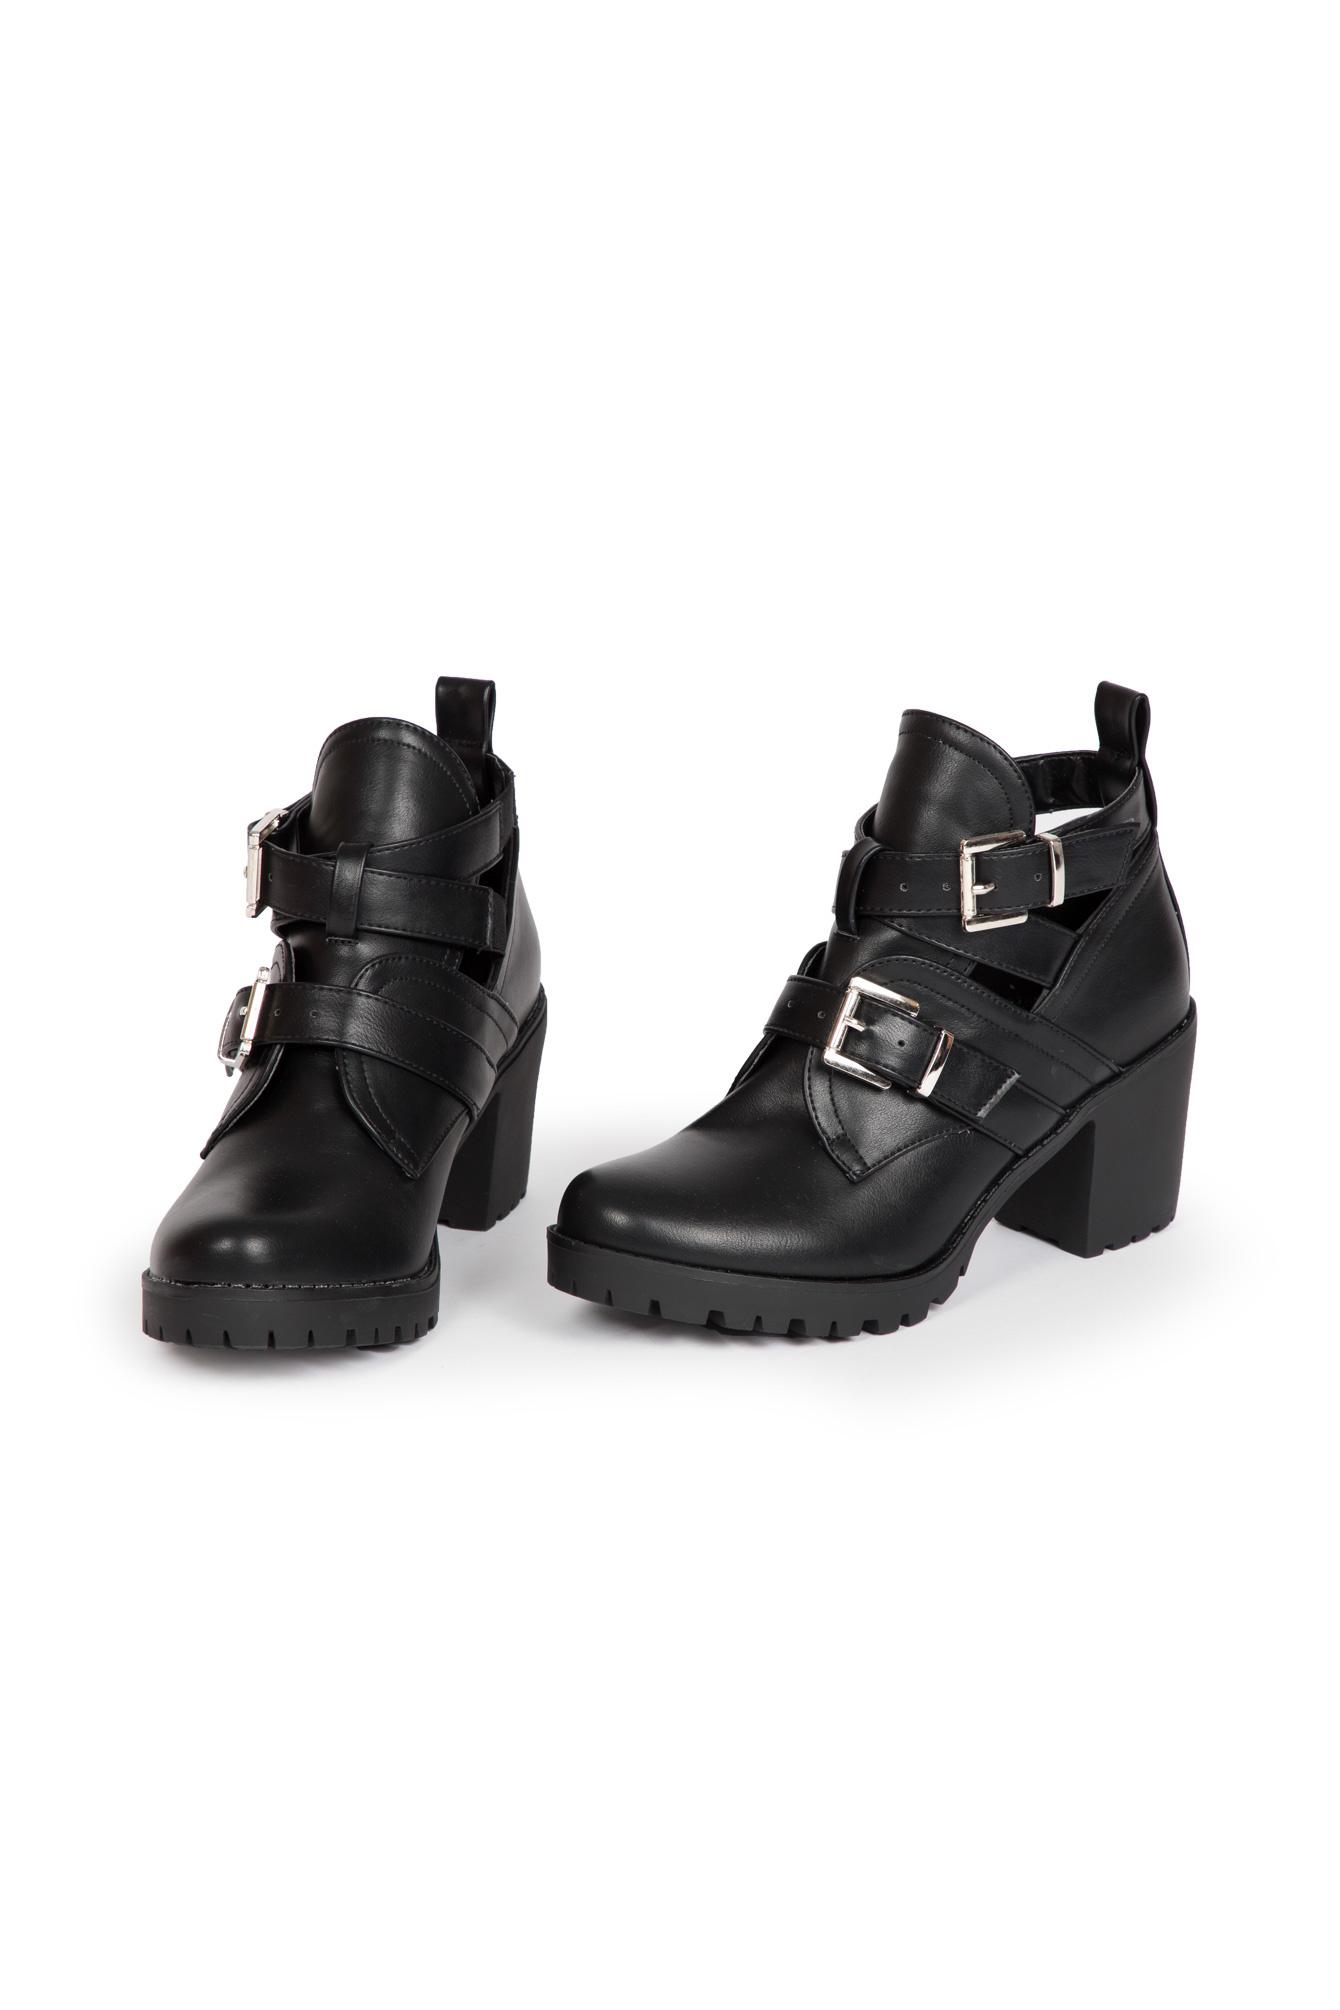 Runway boots